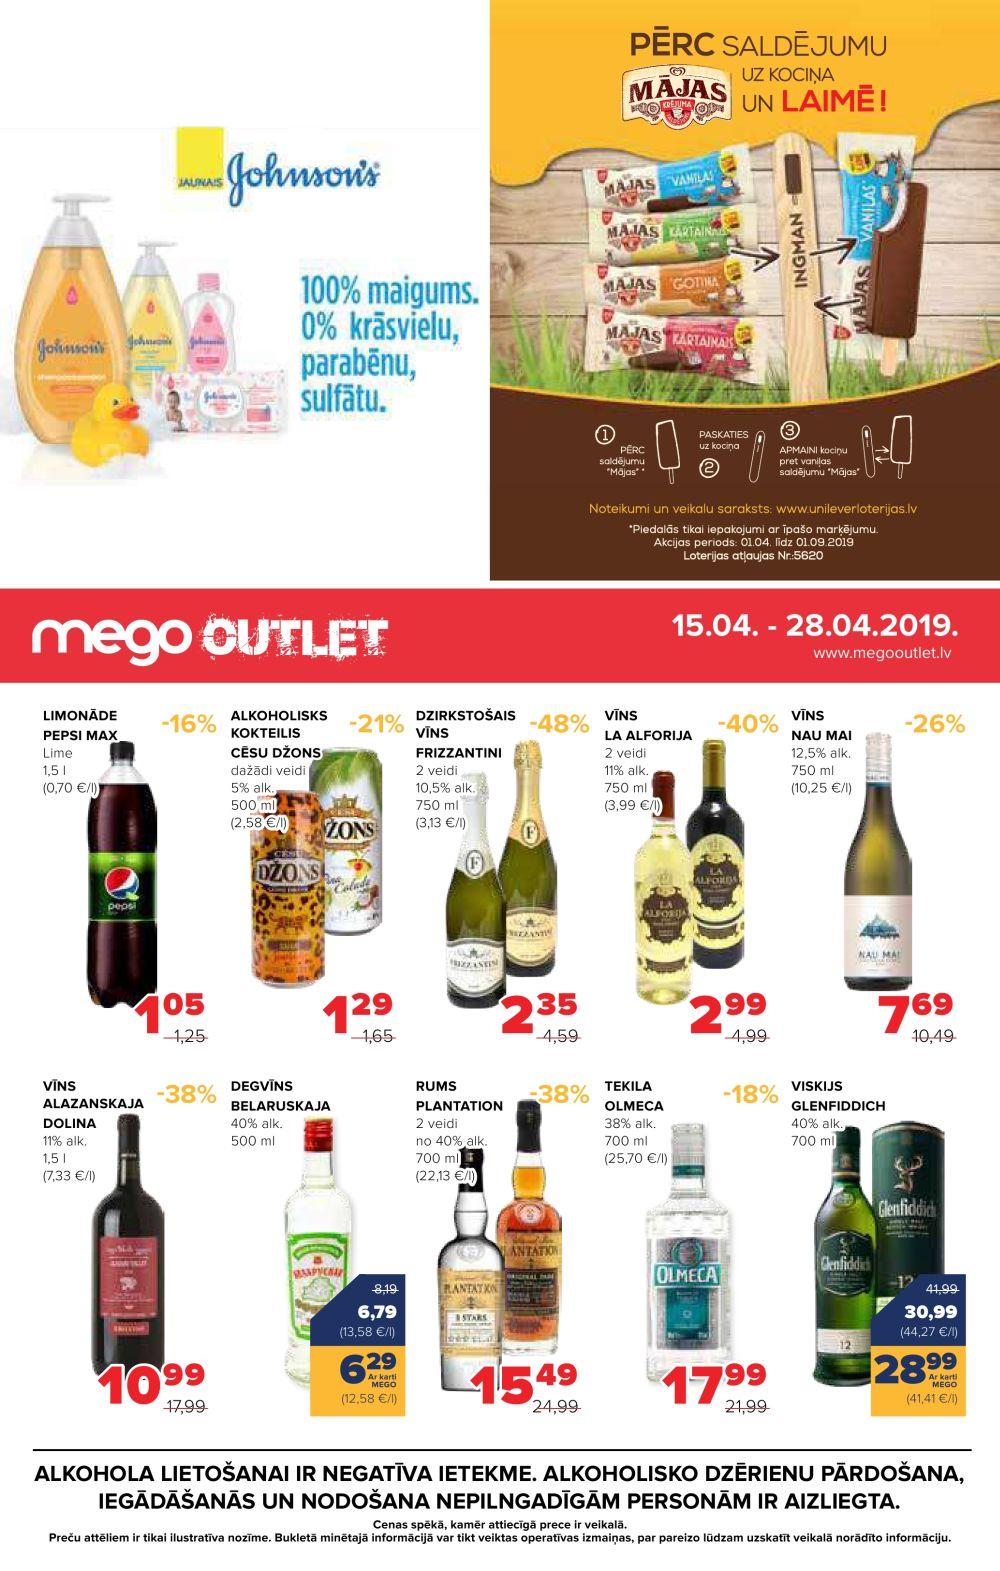 MEGO akcijas buklets N.16  15.04.2019 - 28.04.2019